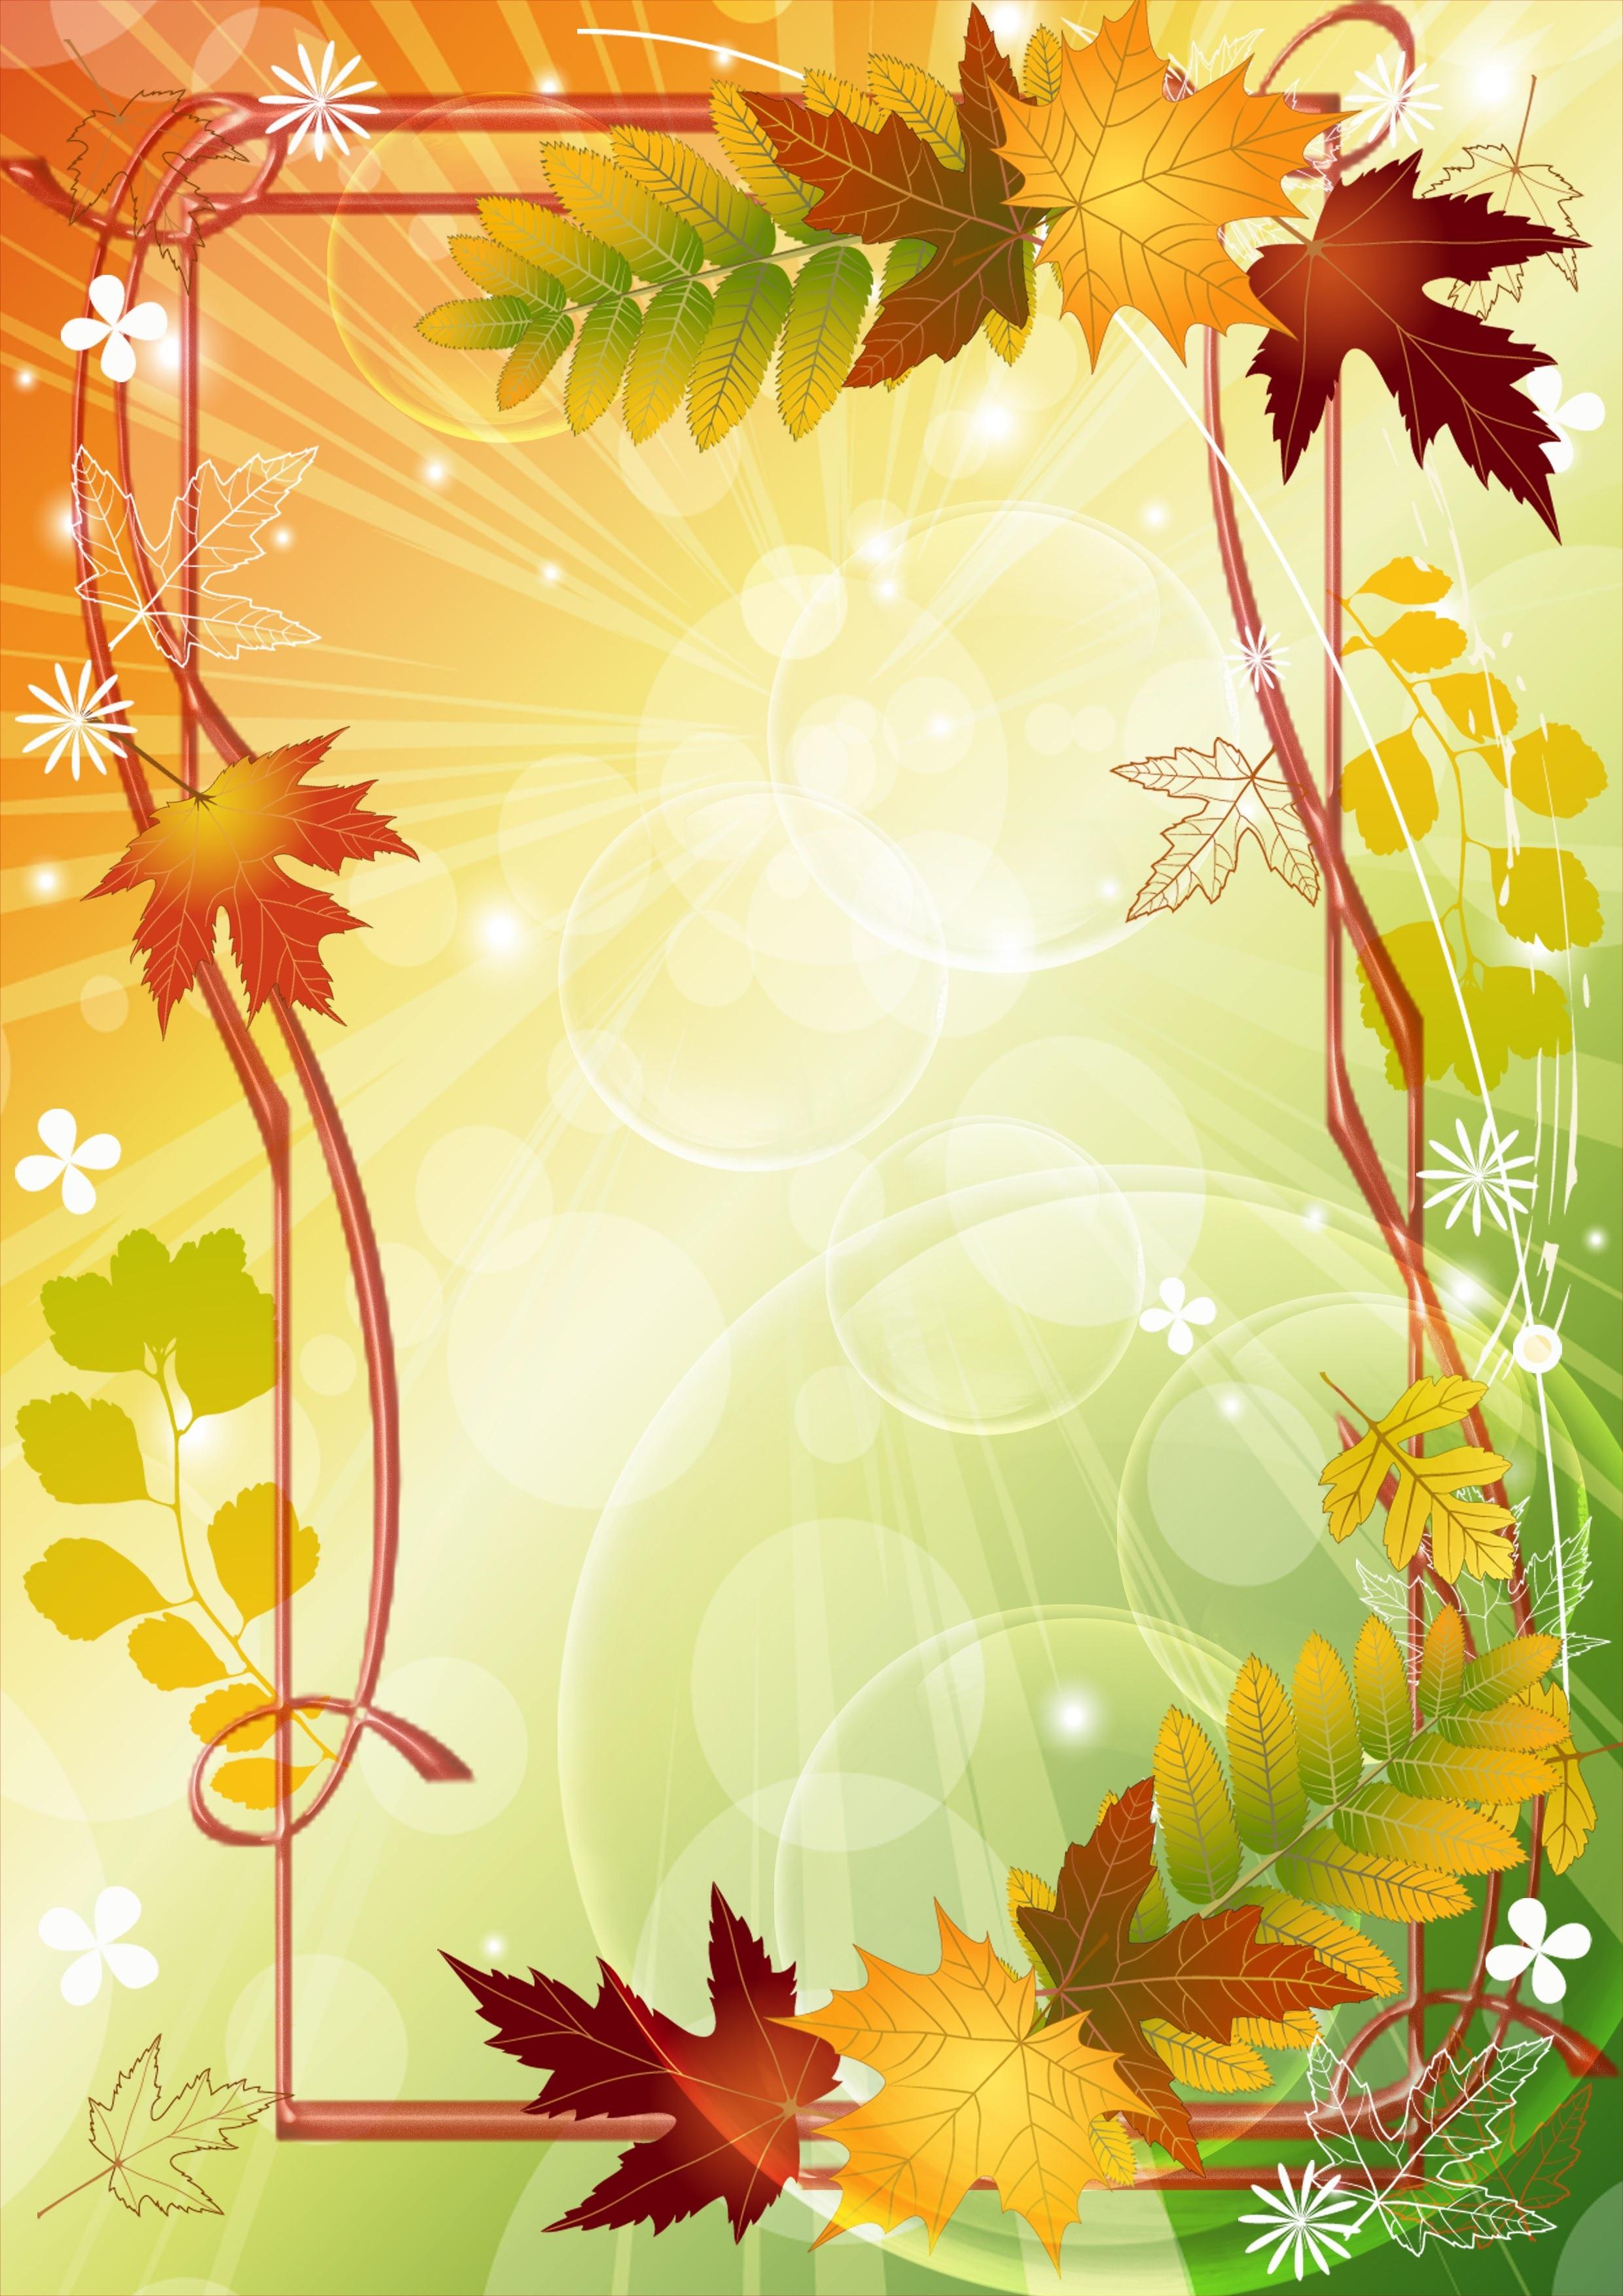 Литл пони, картинки осень без текста